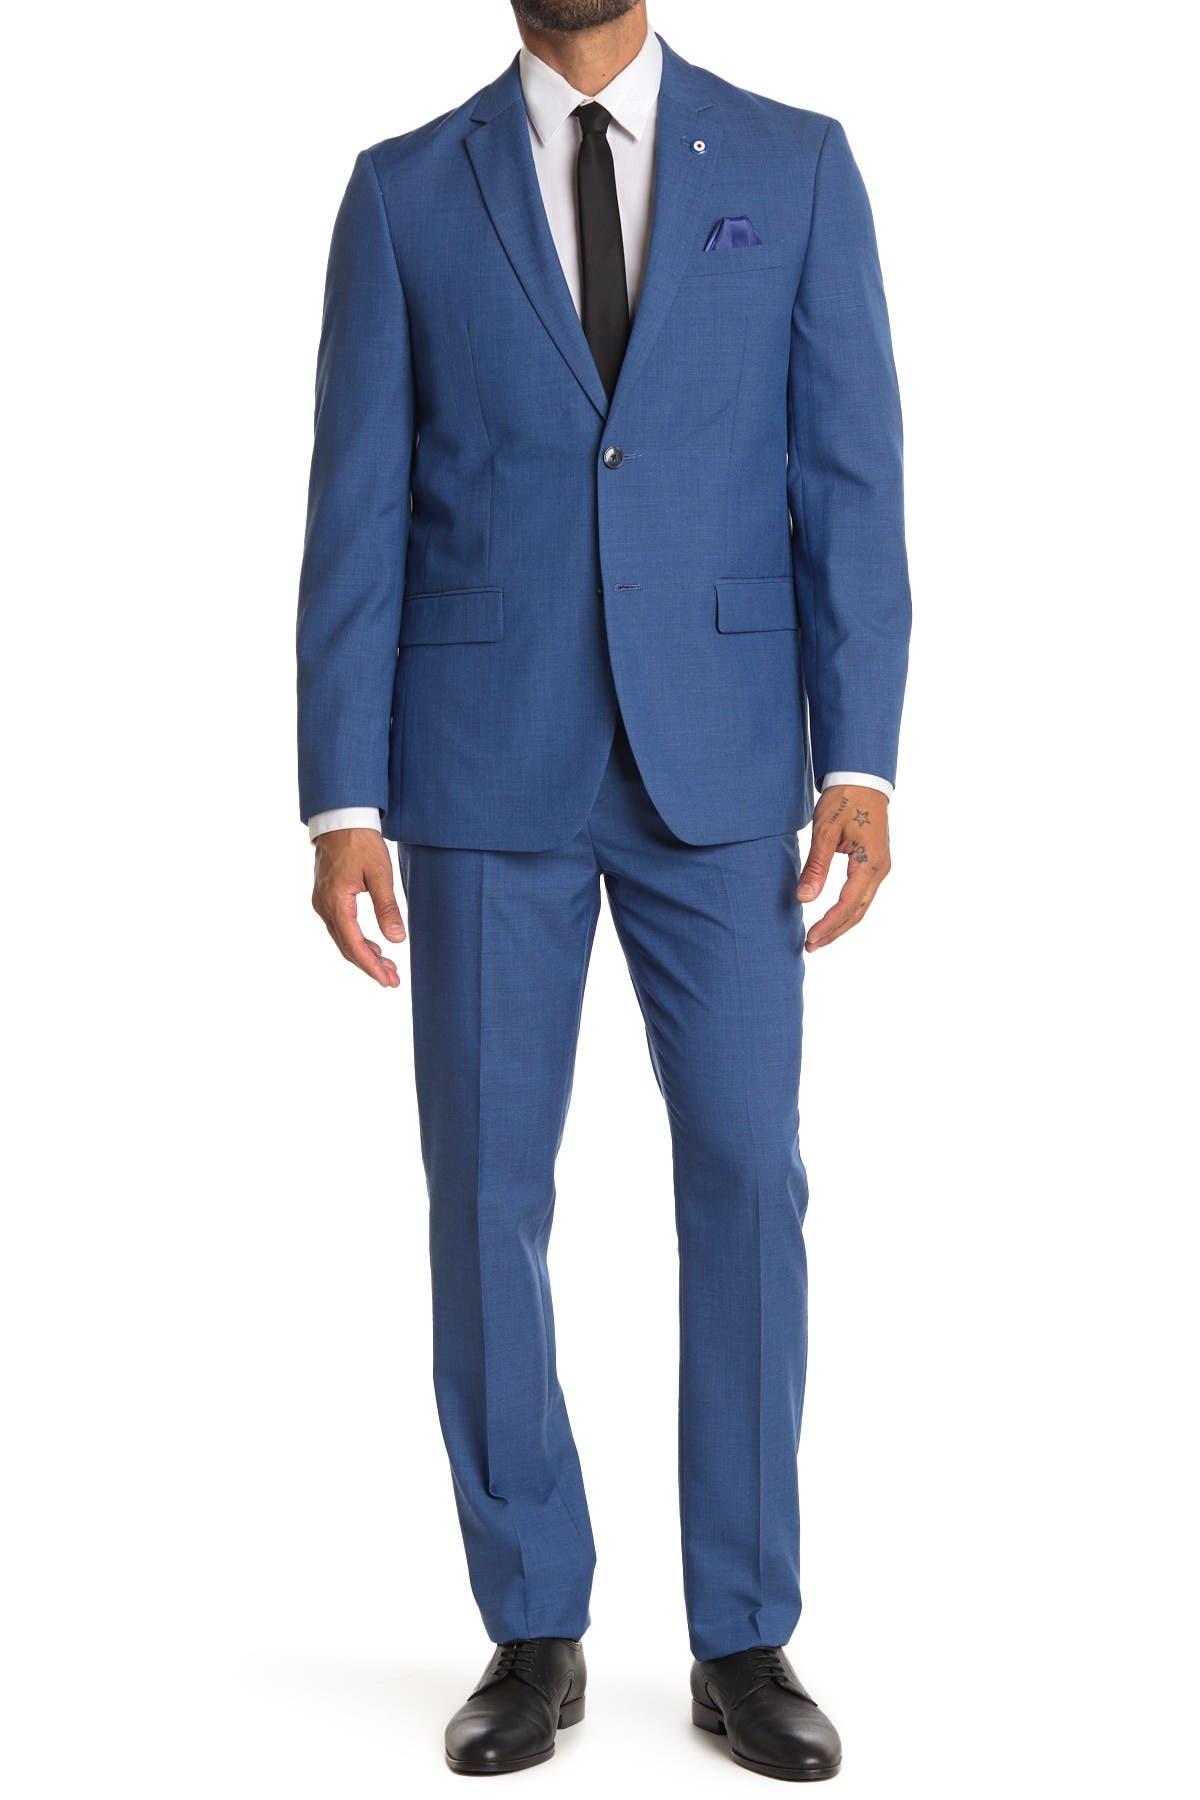 Image of Ben Sherman Blue Sharkskin Slim Fit 2-Piece Suit